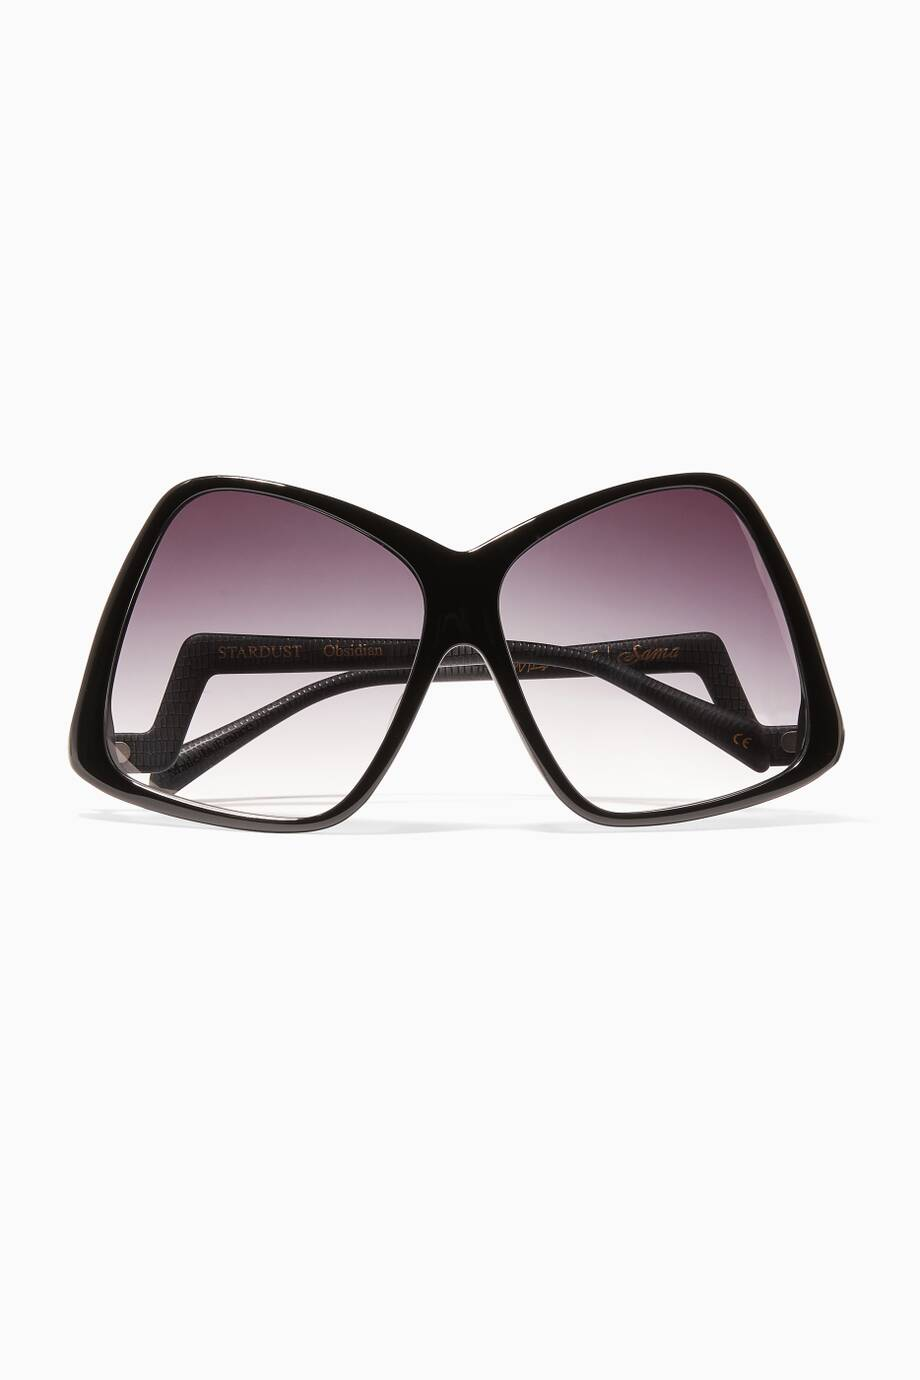 Eyewear Eyewear Eyewear Sama Sama Sama Sama Sama Eyewear Sama Eyewear Sama Sama Eyewear Eyewear Sama Eyewear Eyewear XAdc7w